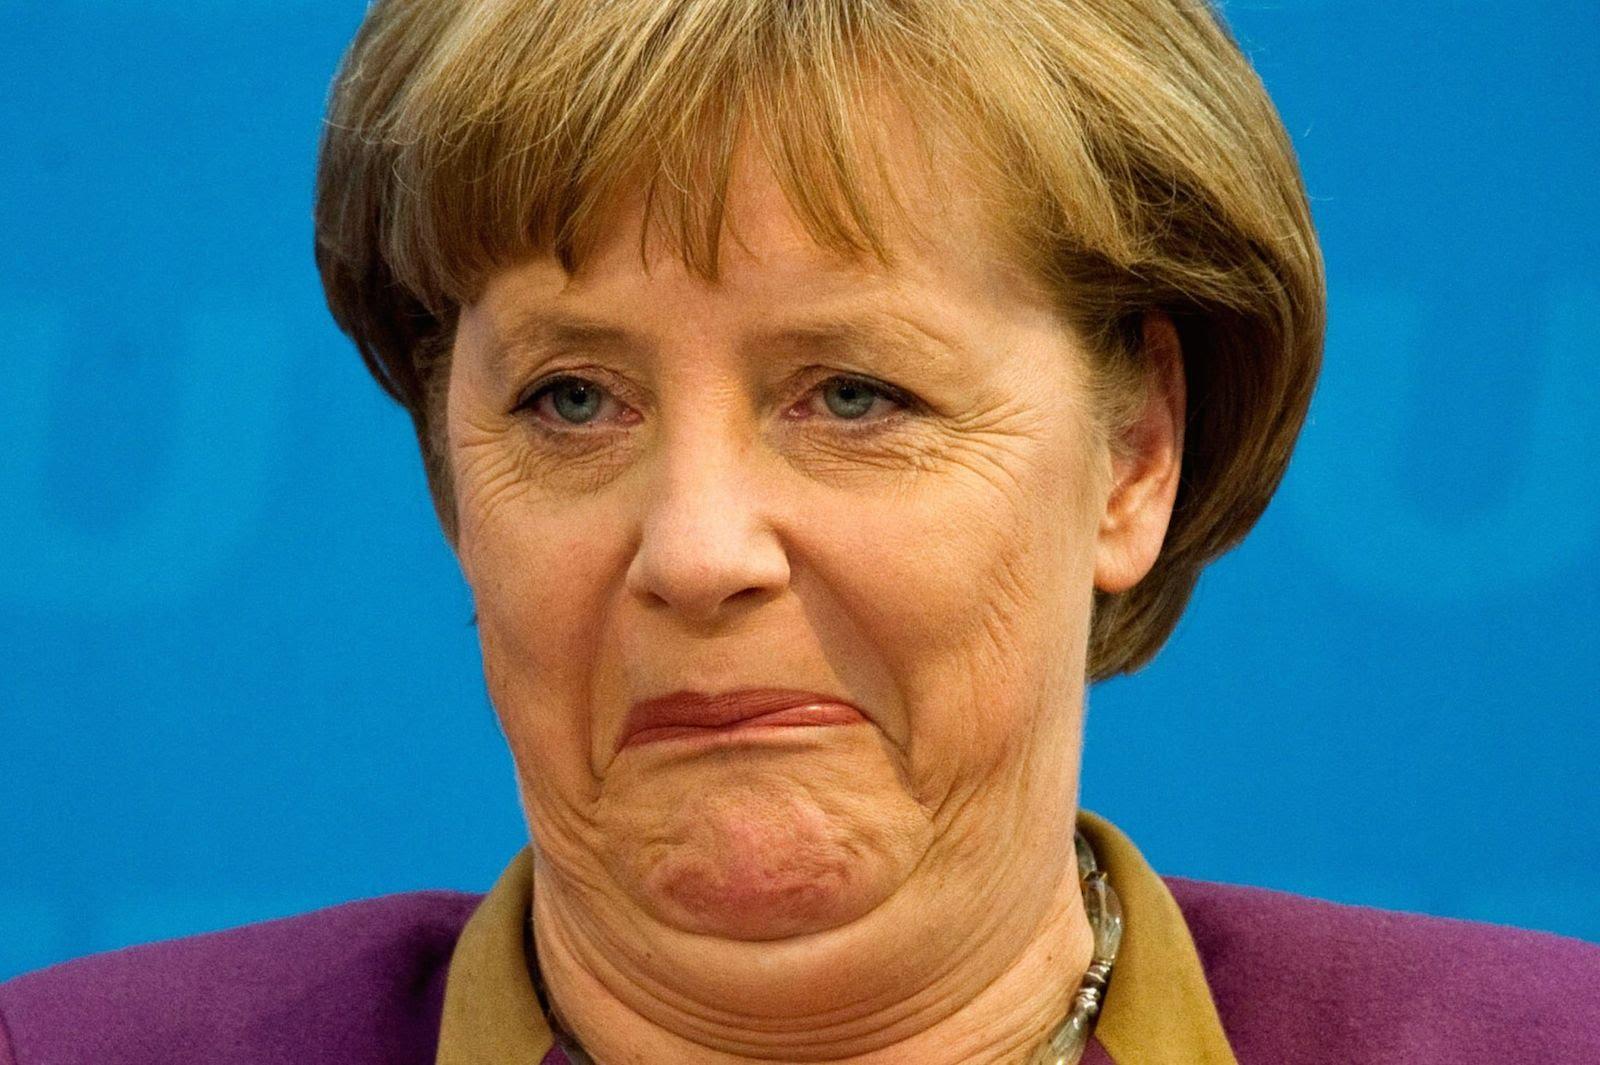 La Cancelliera Angela Merkel